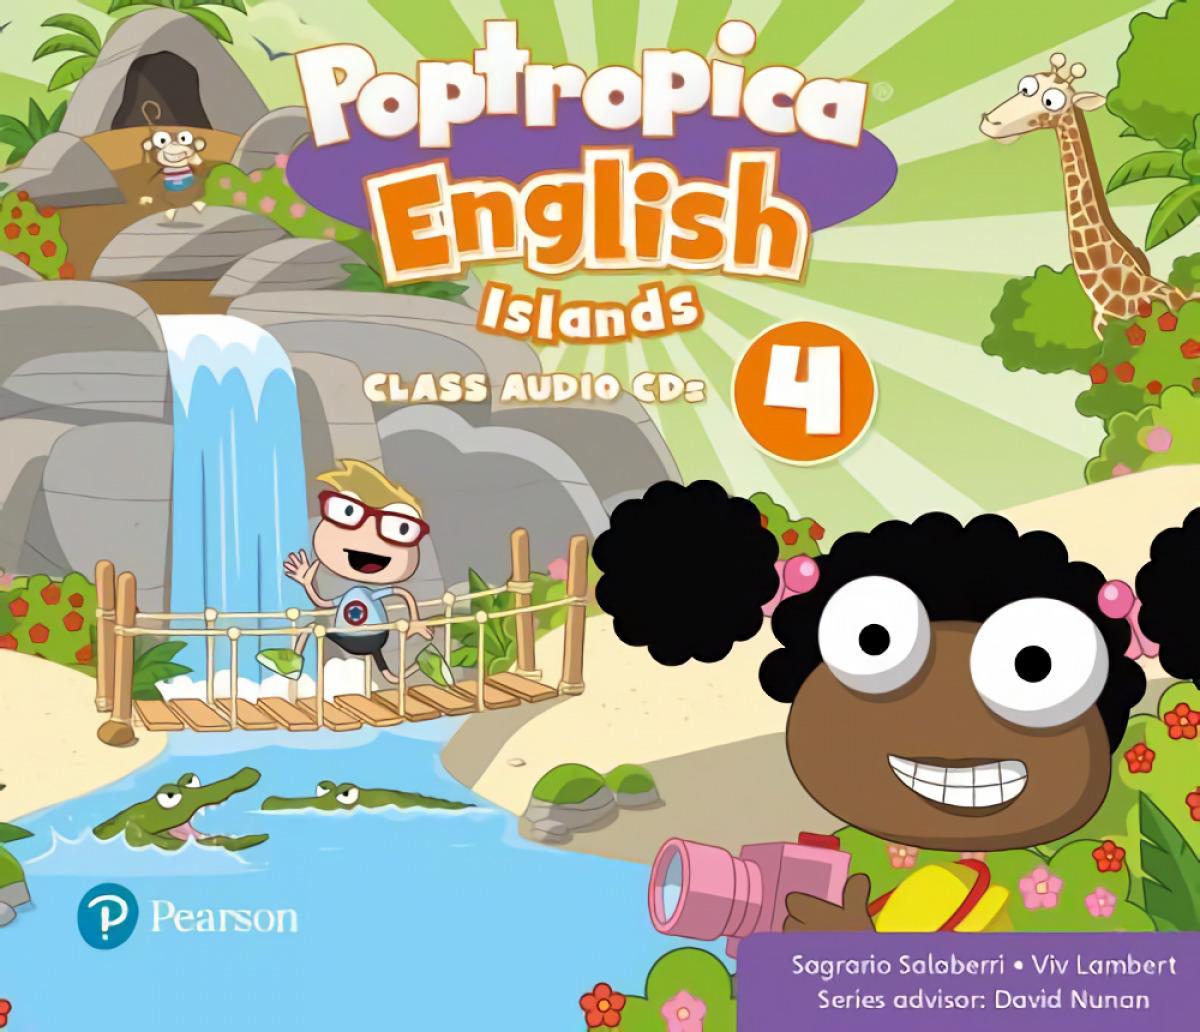 POPTROPICA ENGLISH ISLANDS LEVEL 4 AUDIO CD